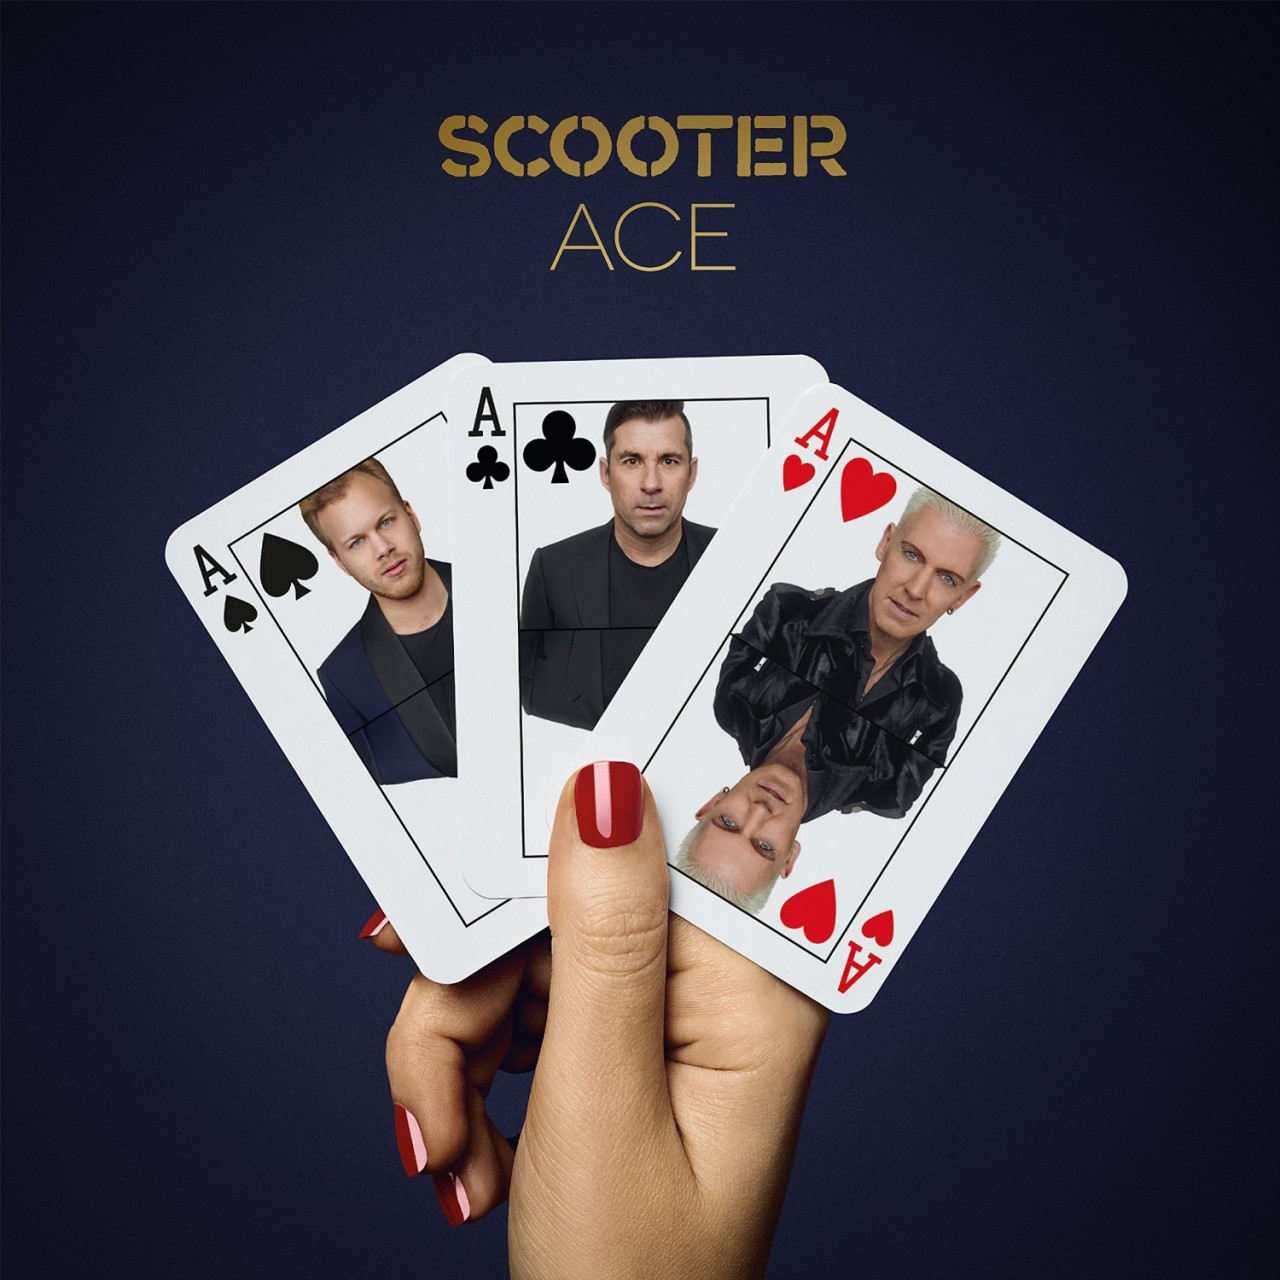 Malte Frank | Postproduction SCOOTER / ACE